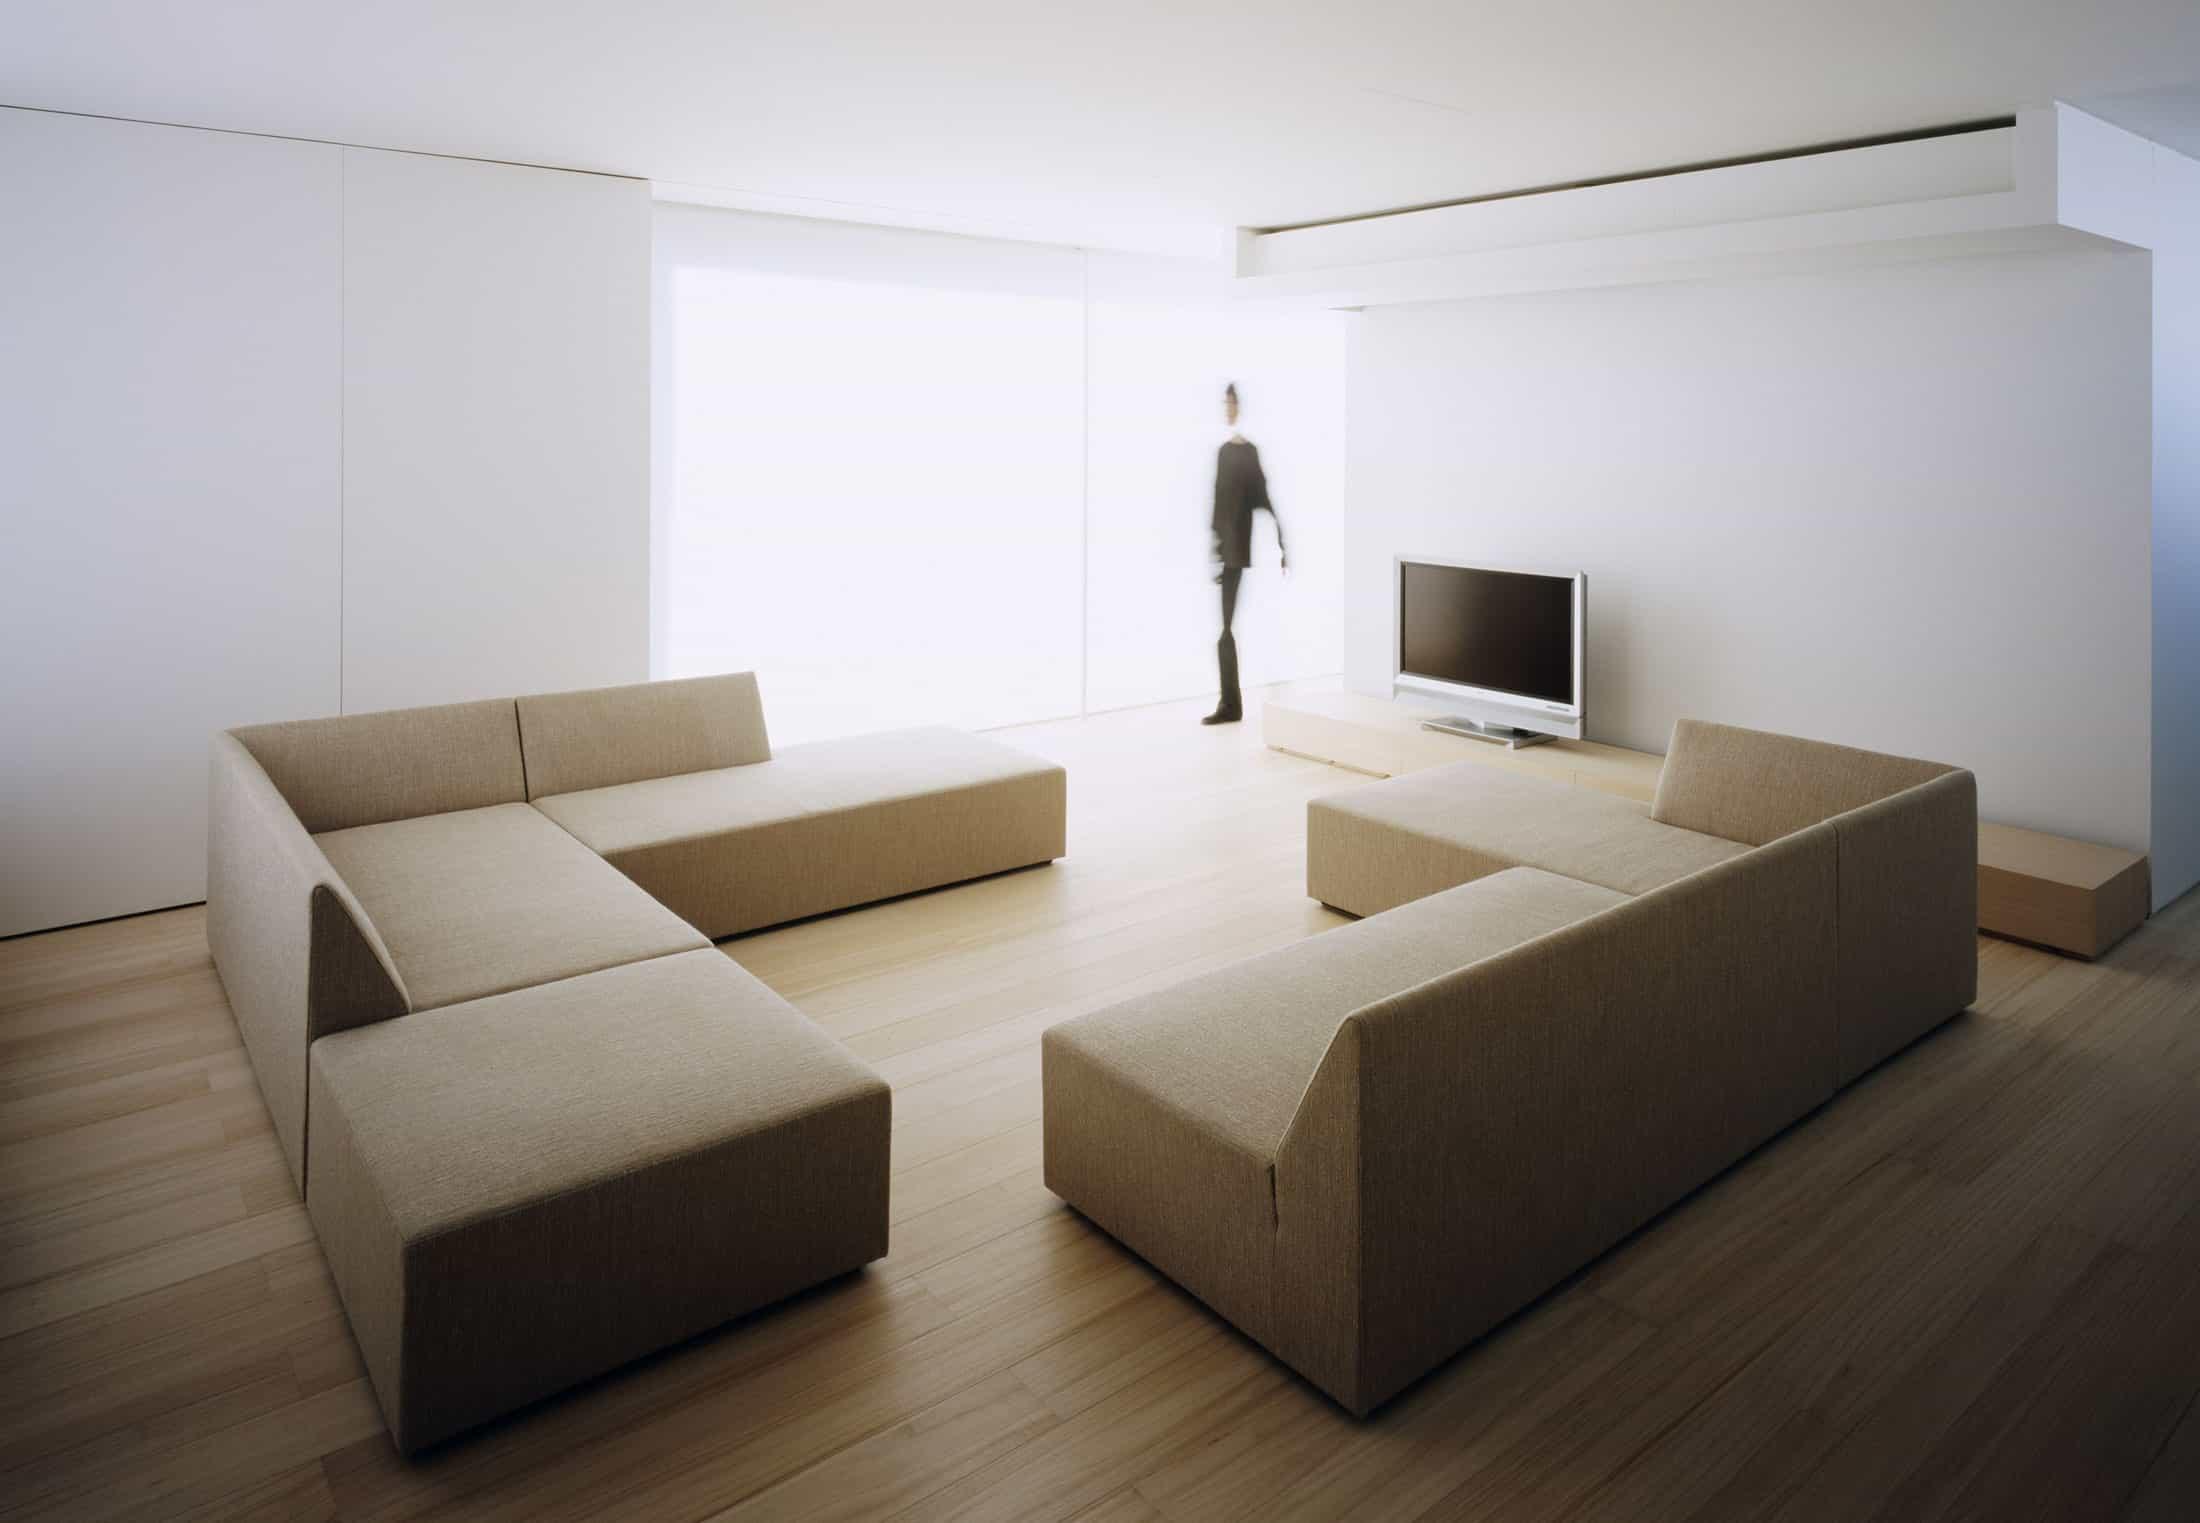 C1 House by Curiosity Architects